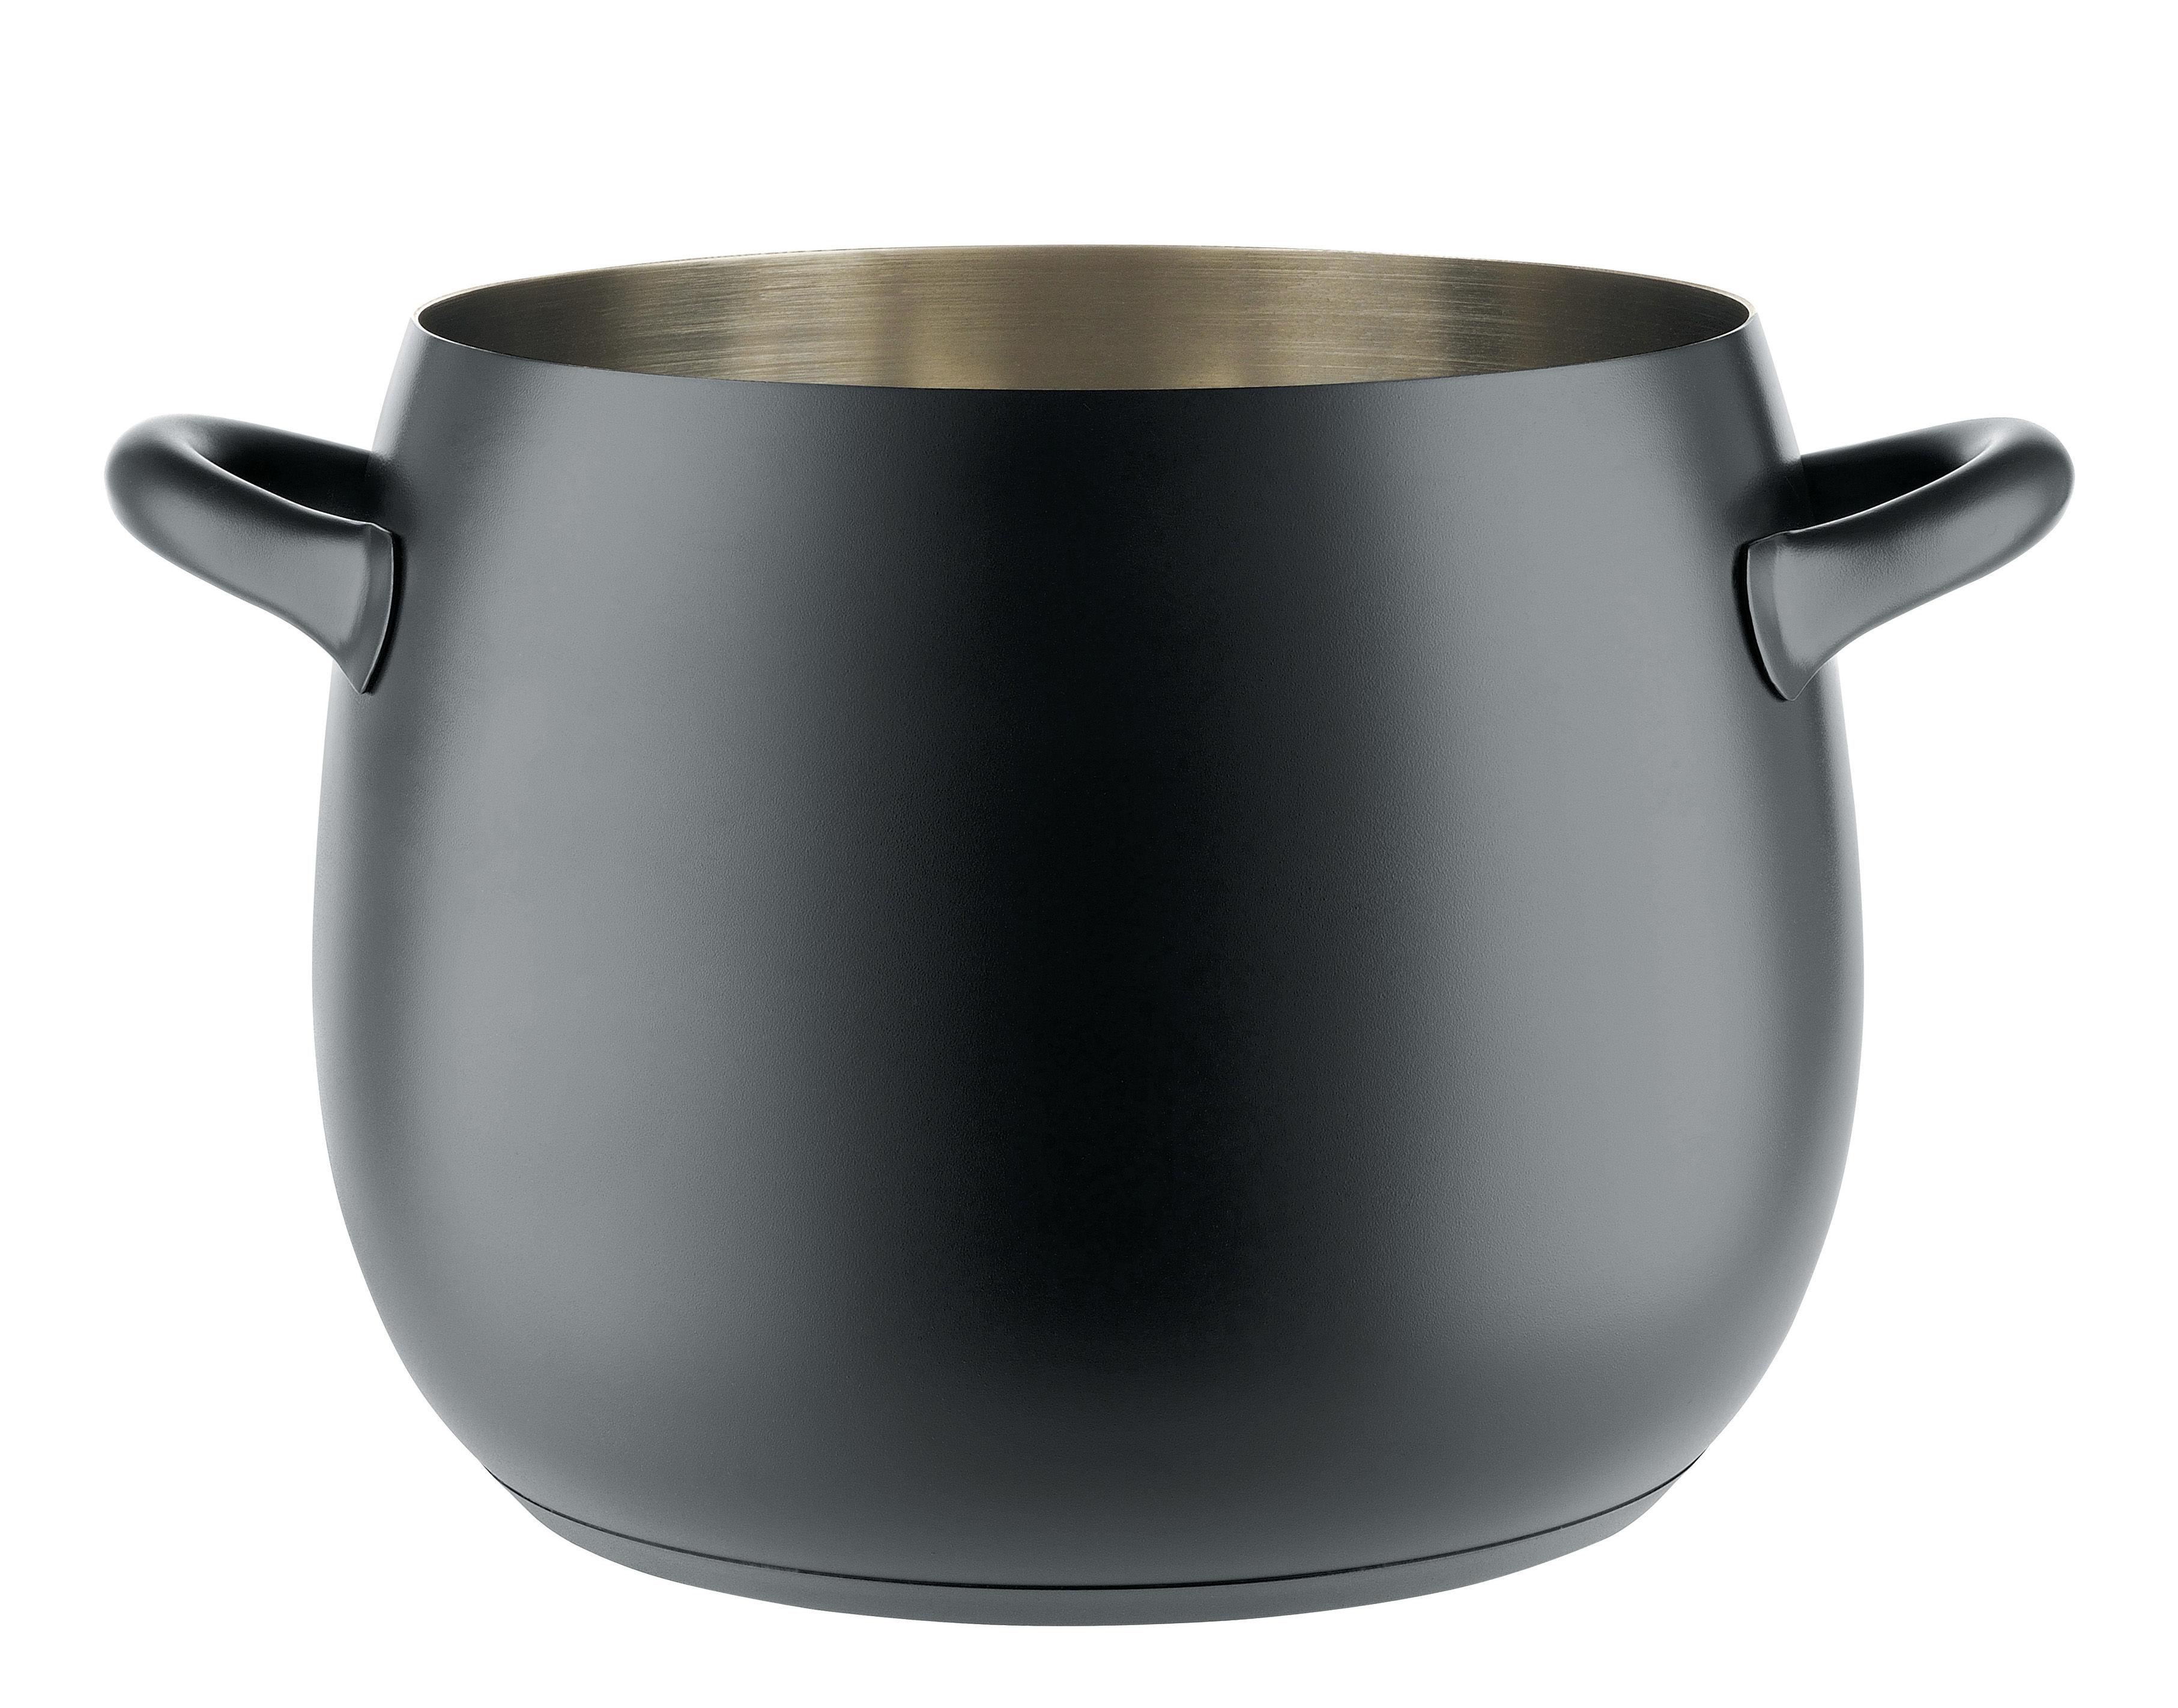 Cucina - Pentole, Padelle e Casseruole - Pentola Mami 3.0 / 10 Litri - Ø 27 cm - Alessi - Nero - Acciaio inossidabile, Acier magnétique, Résine silicone